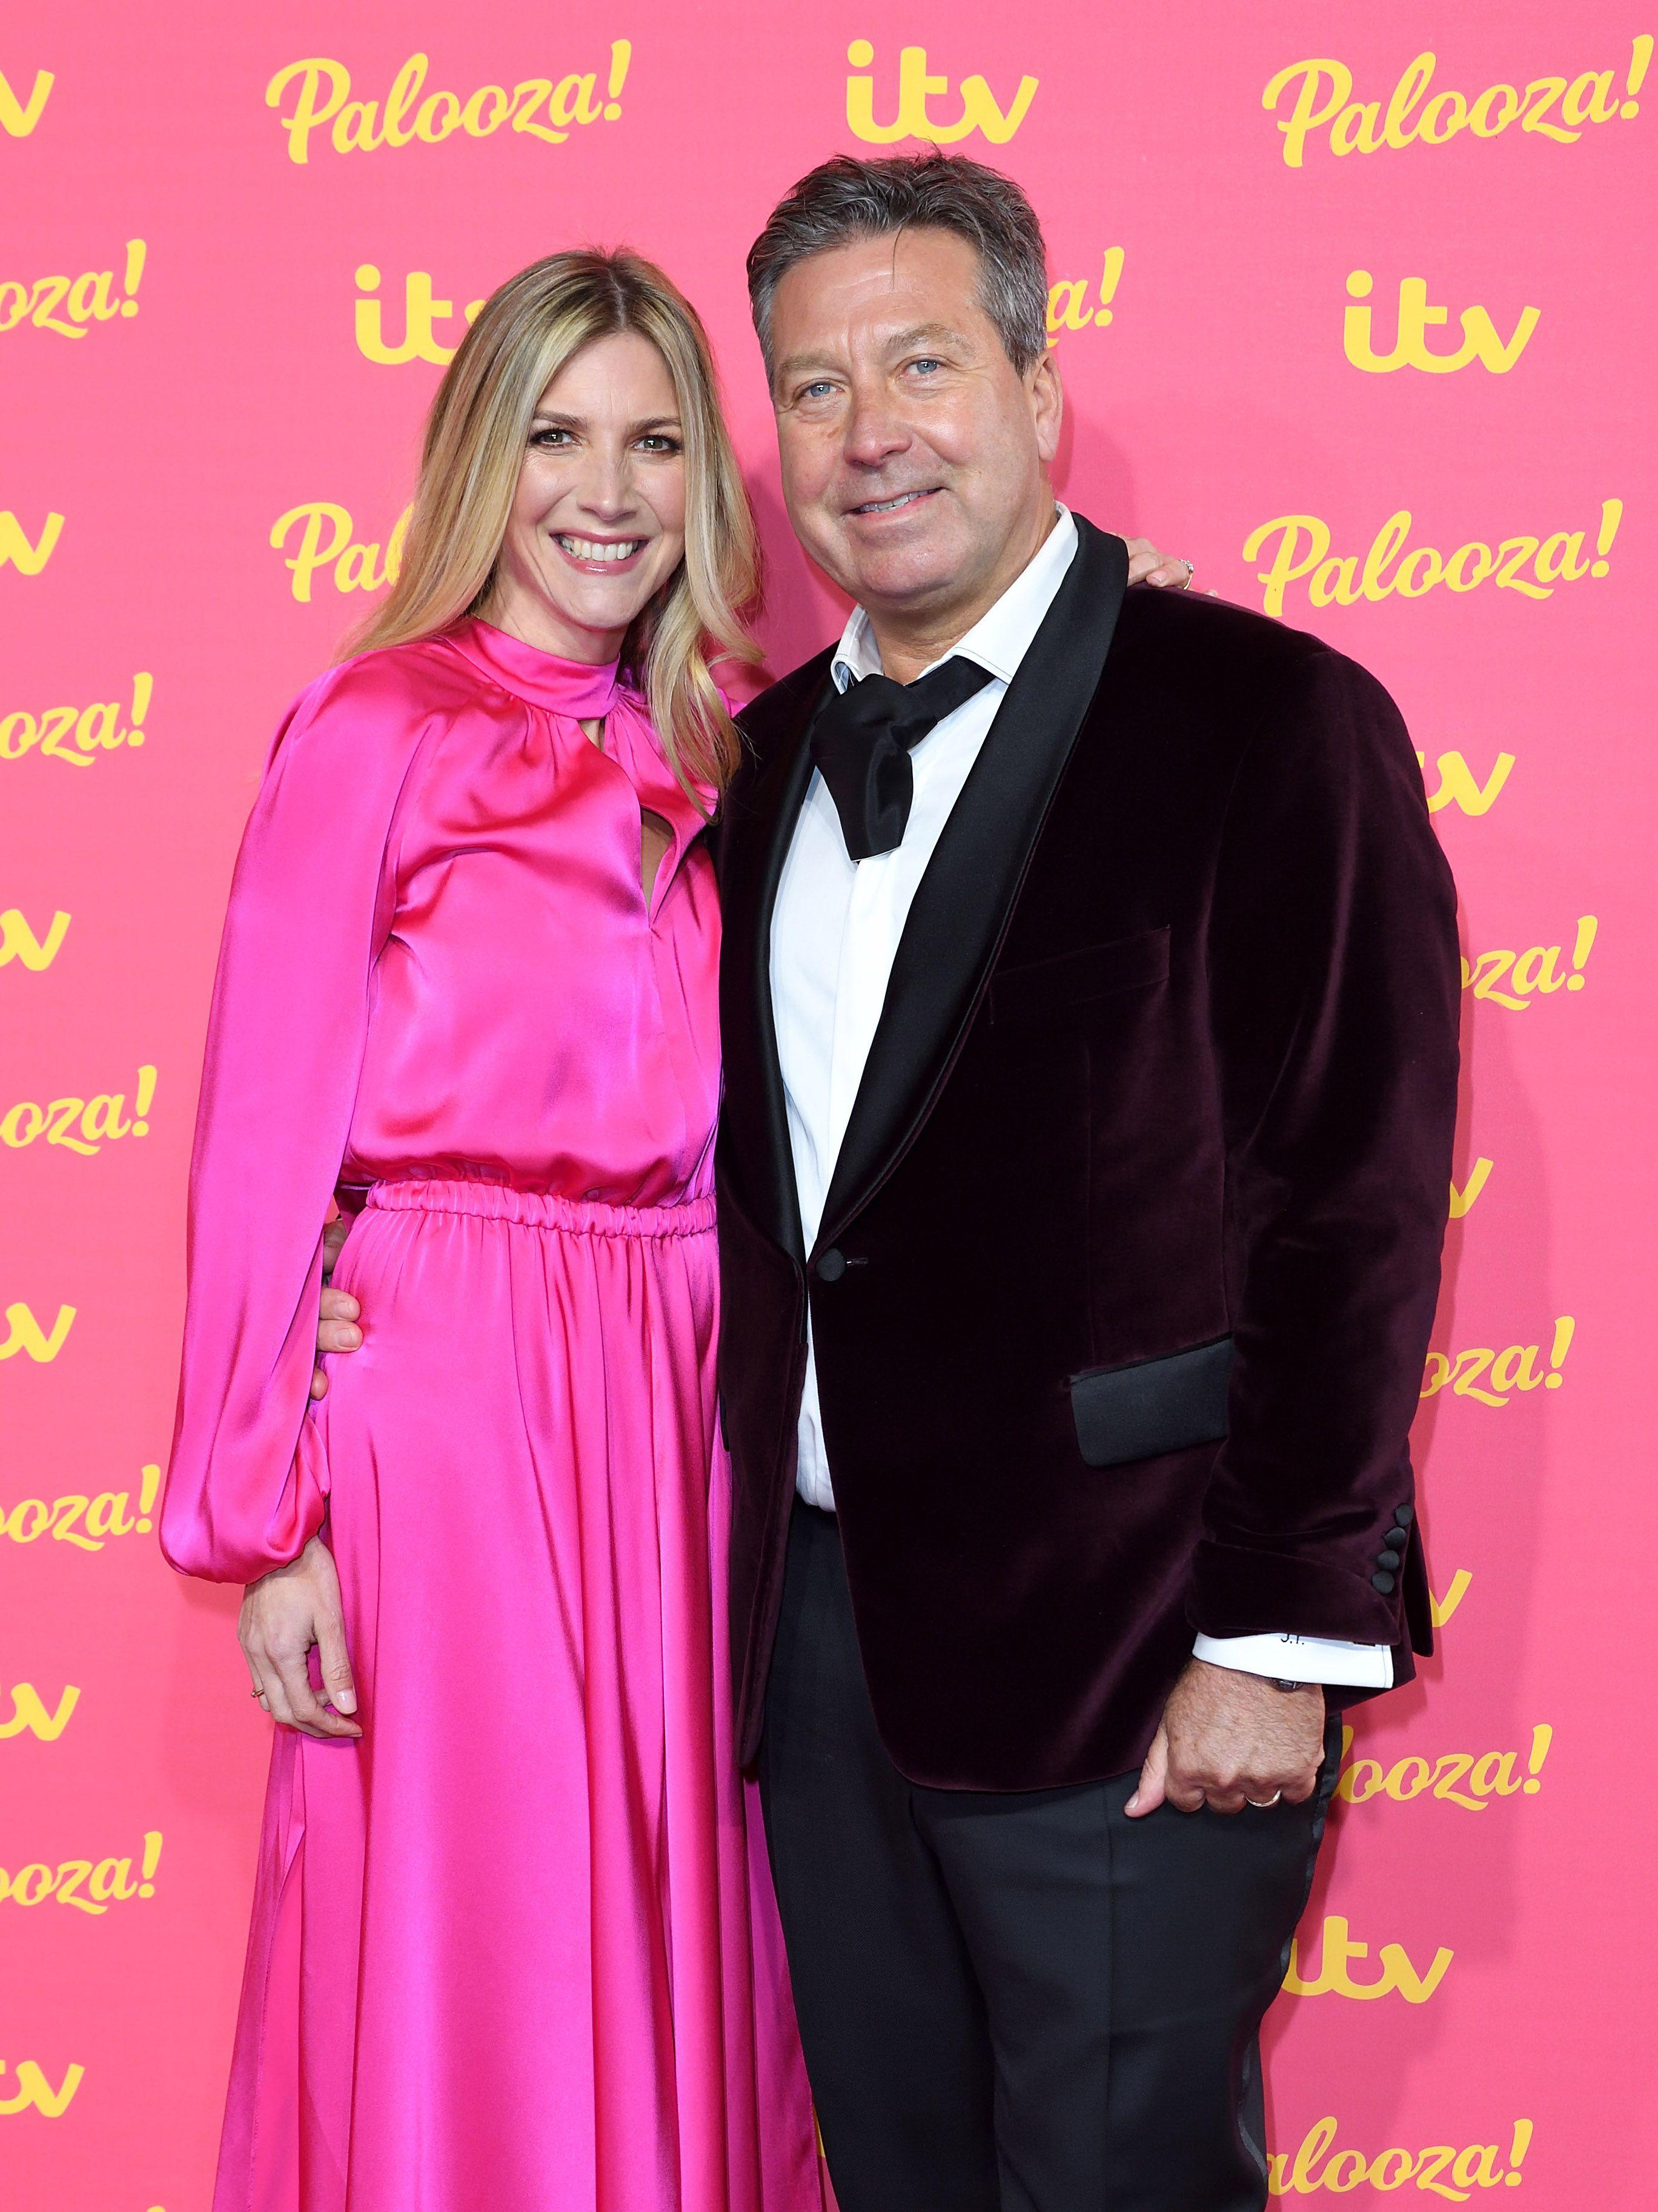 John Torode and Lisa Faulkner hit the red carpet as newlyweds